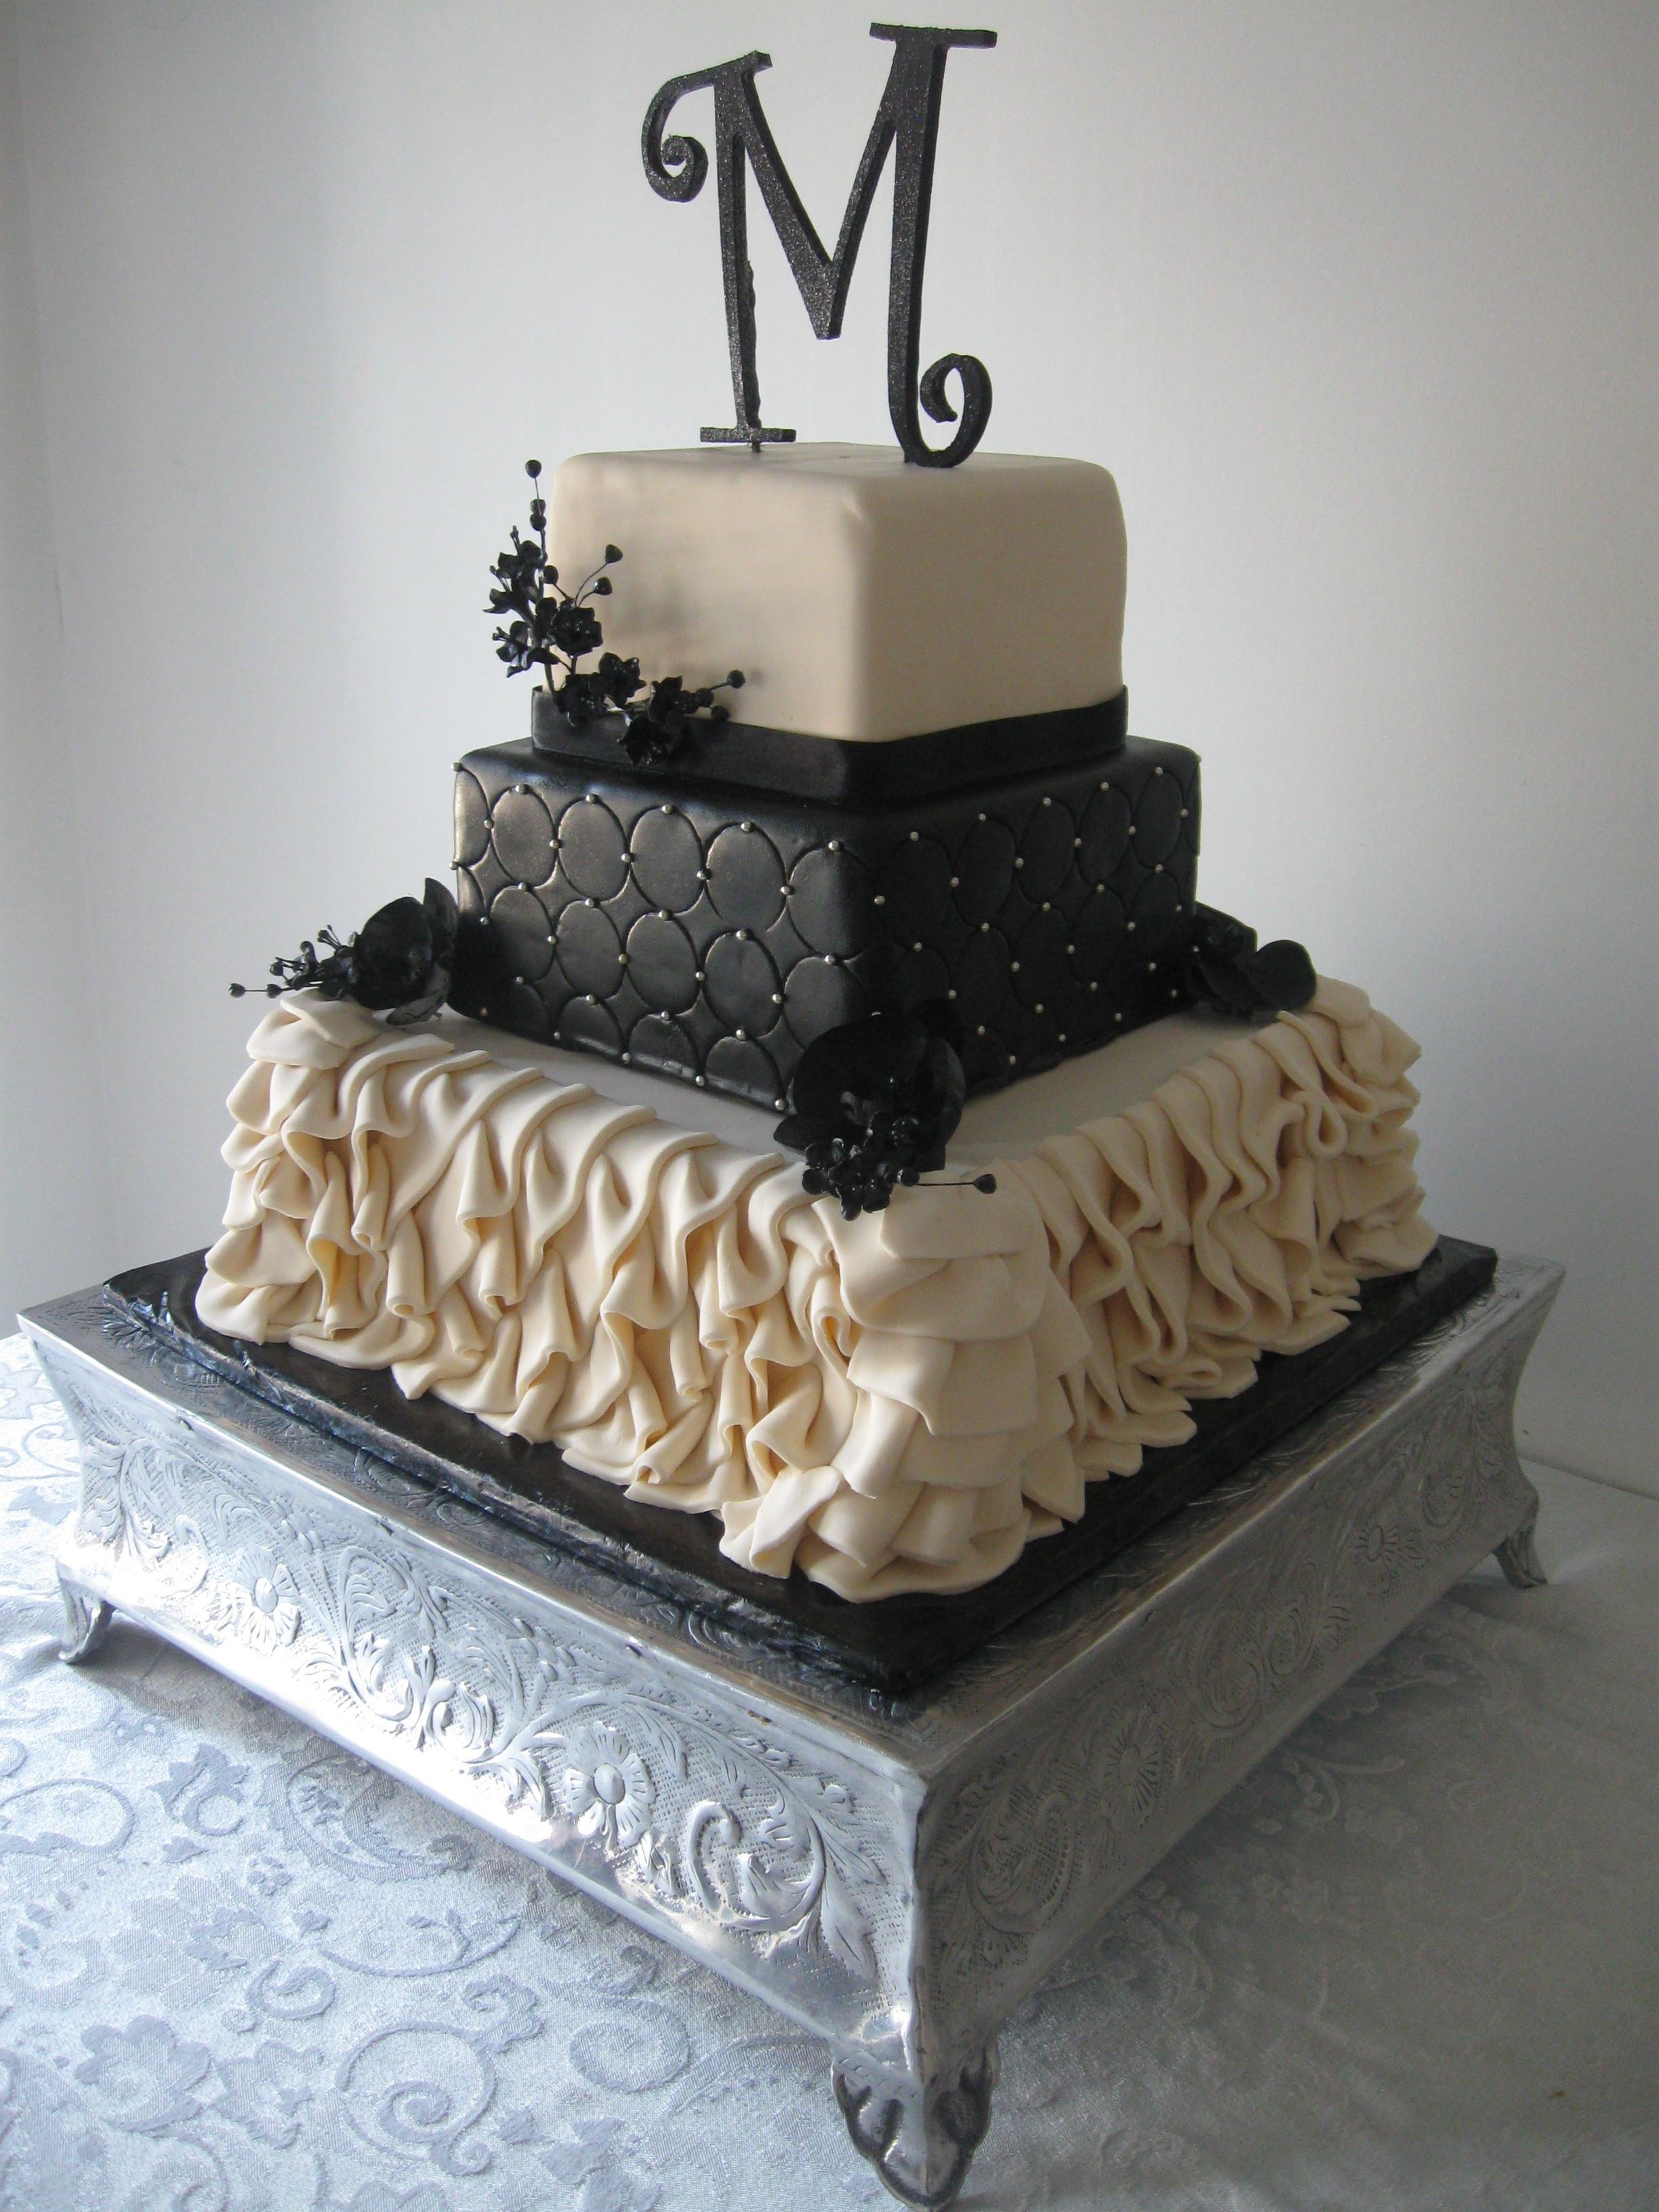 Bethel Bakery Wedding Cakes  Bethel Bakery Wedding Cakes